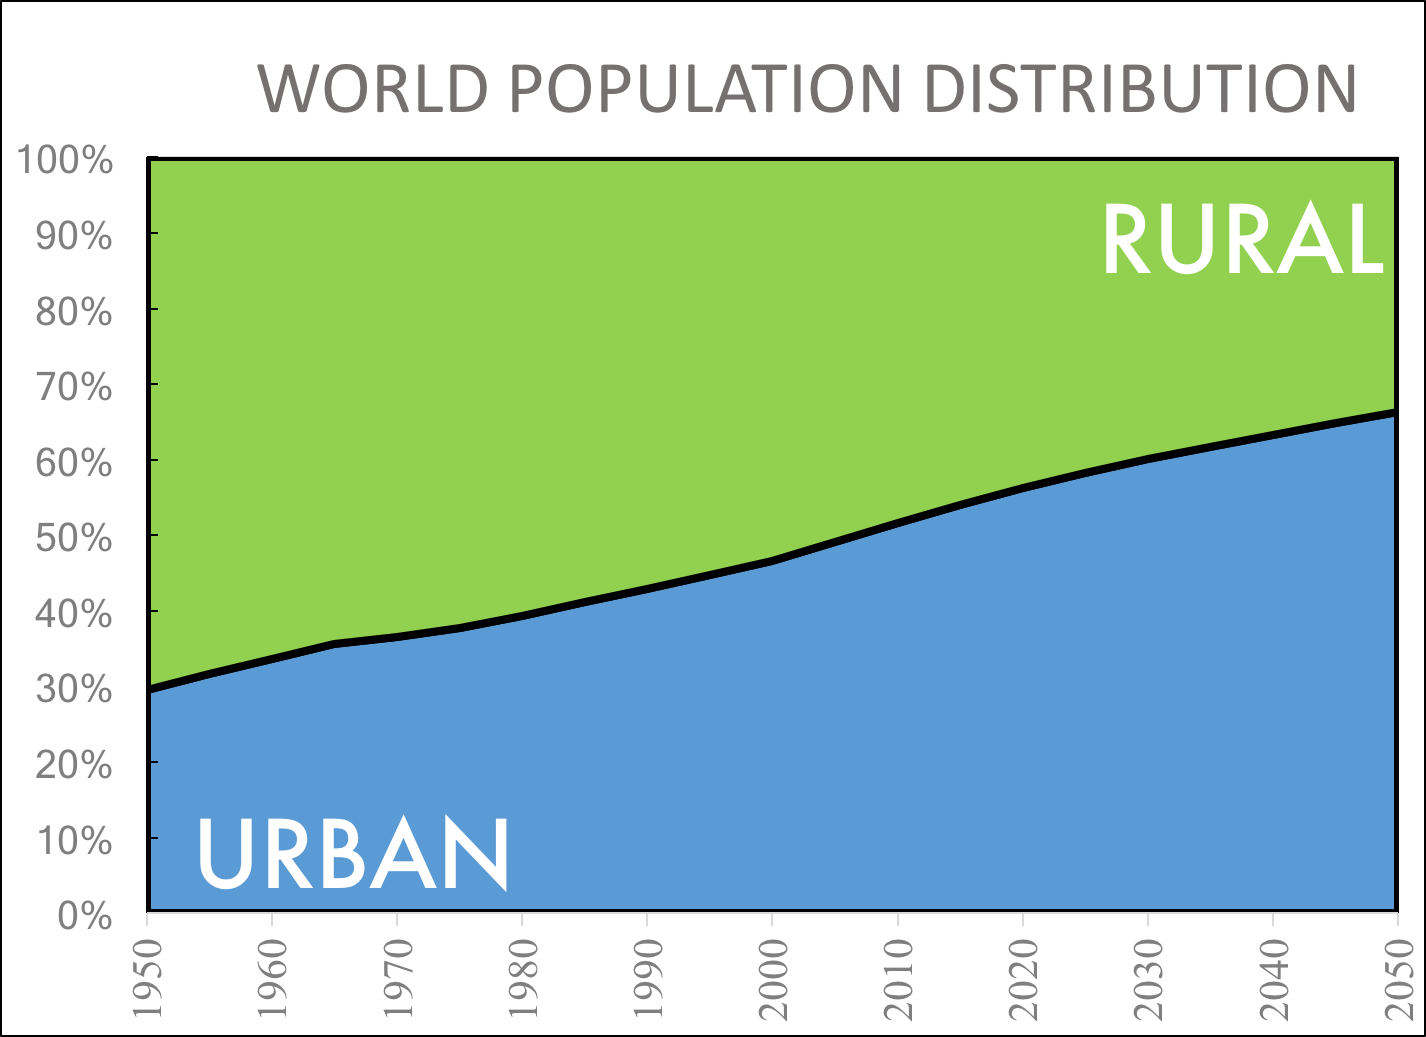 urbanization trends